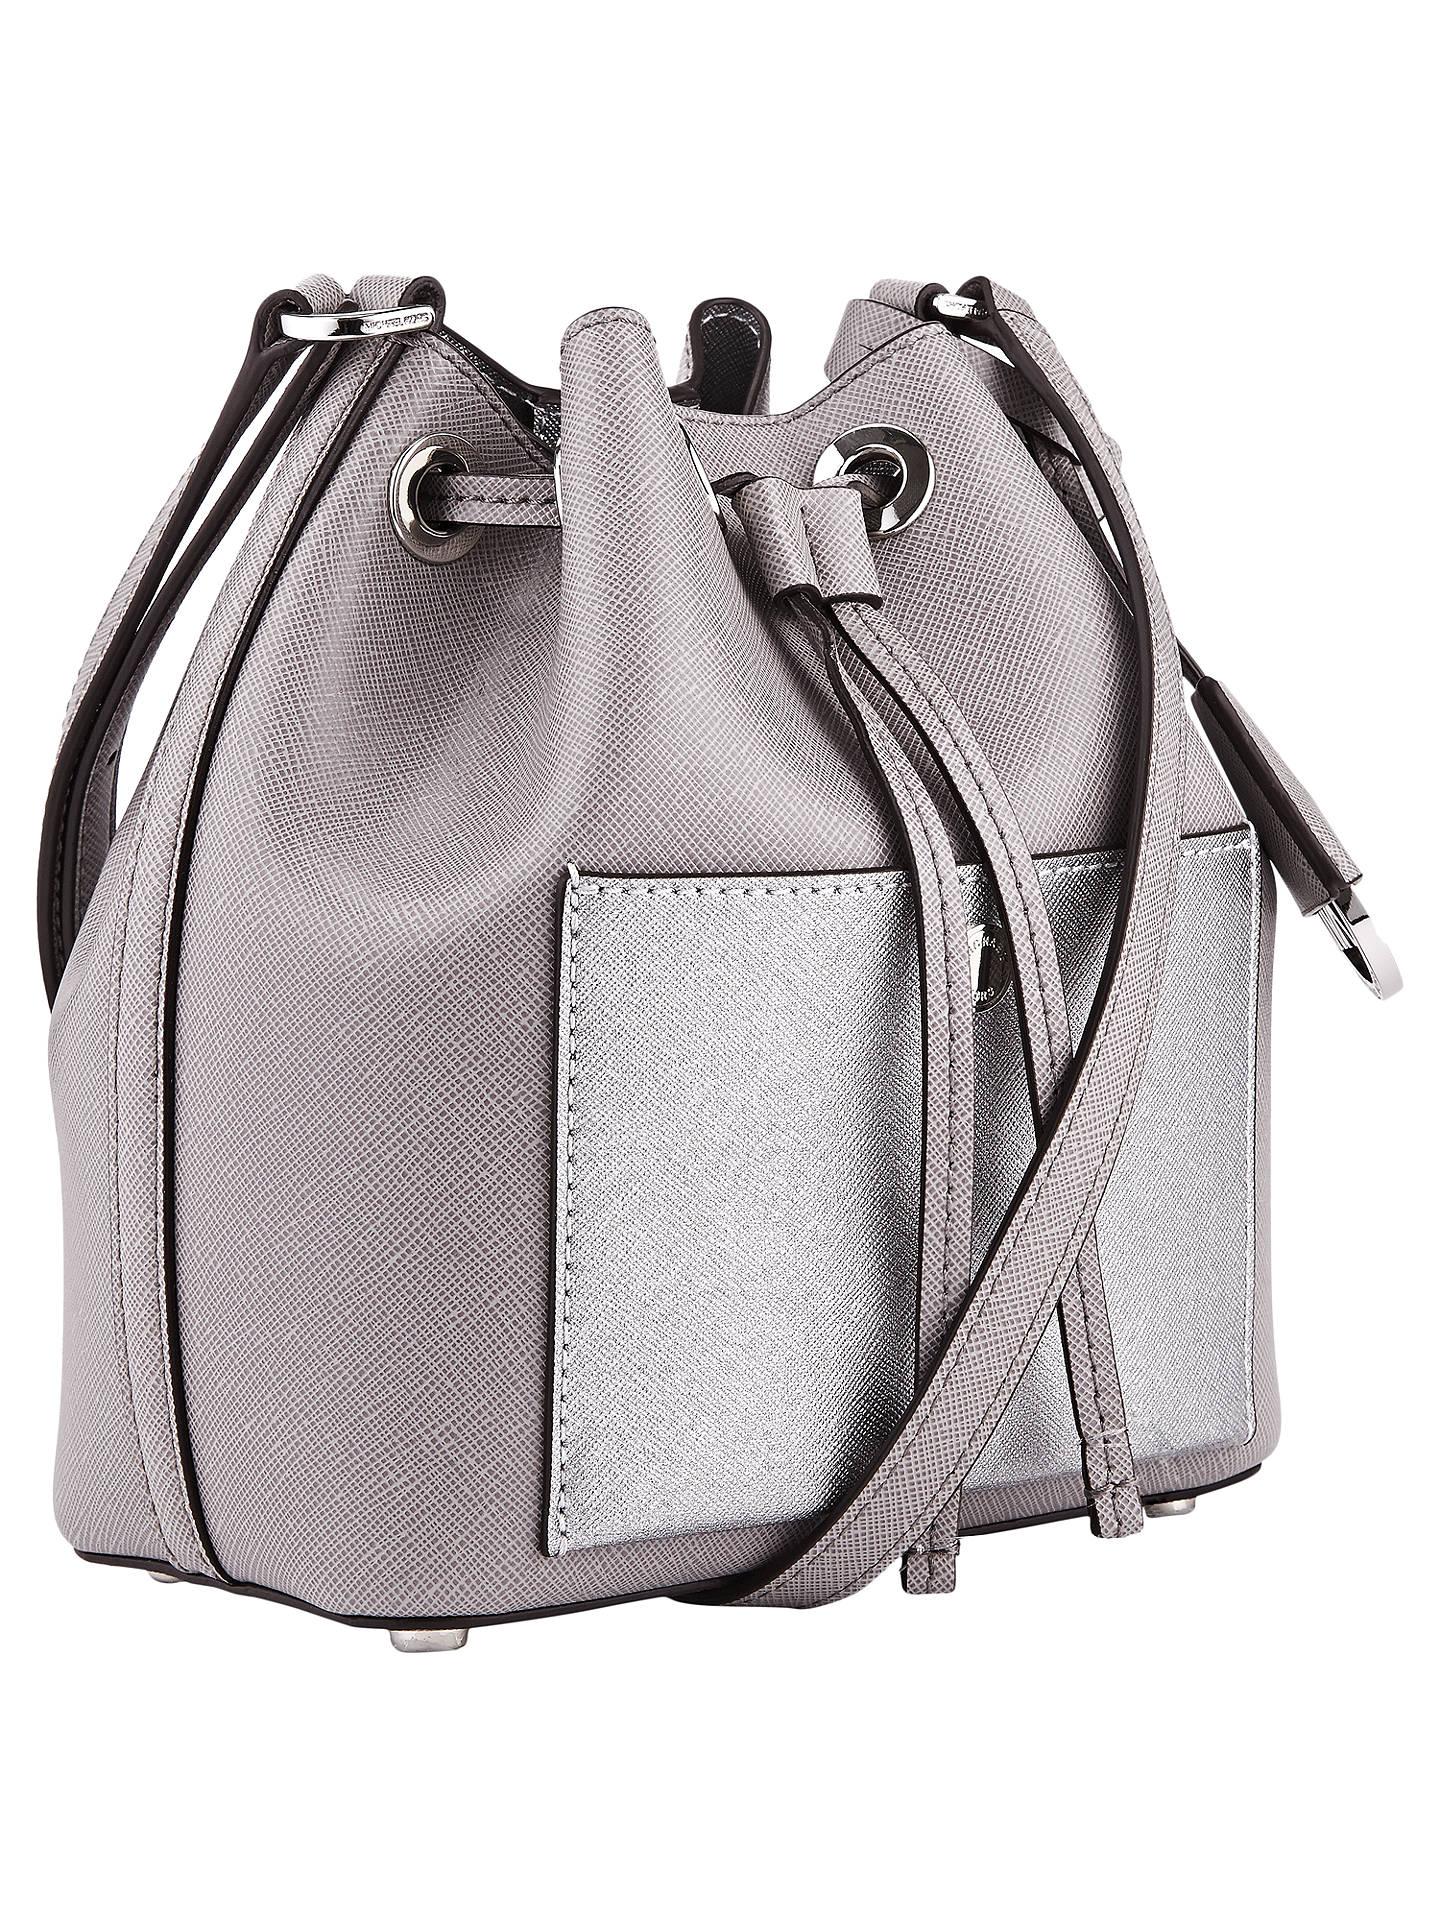 2a4a4abaaf MICHAEL Michael Kors Greenwich Small Bucket Bag at John Lewis   Partners